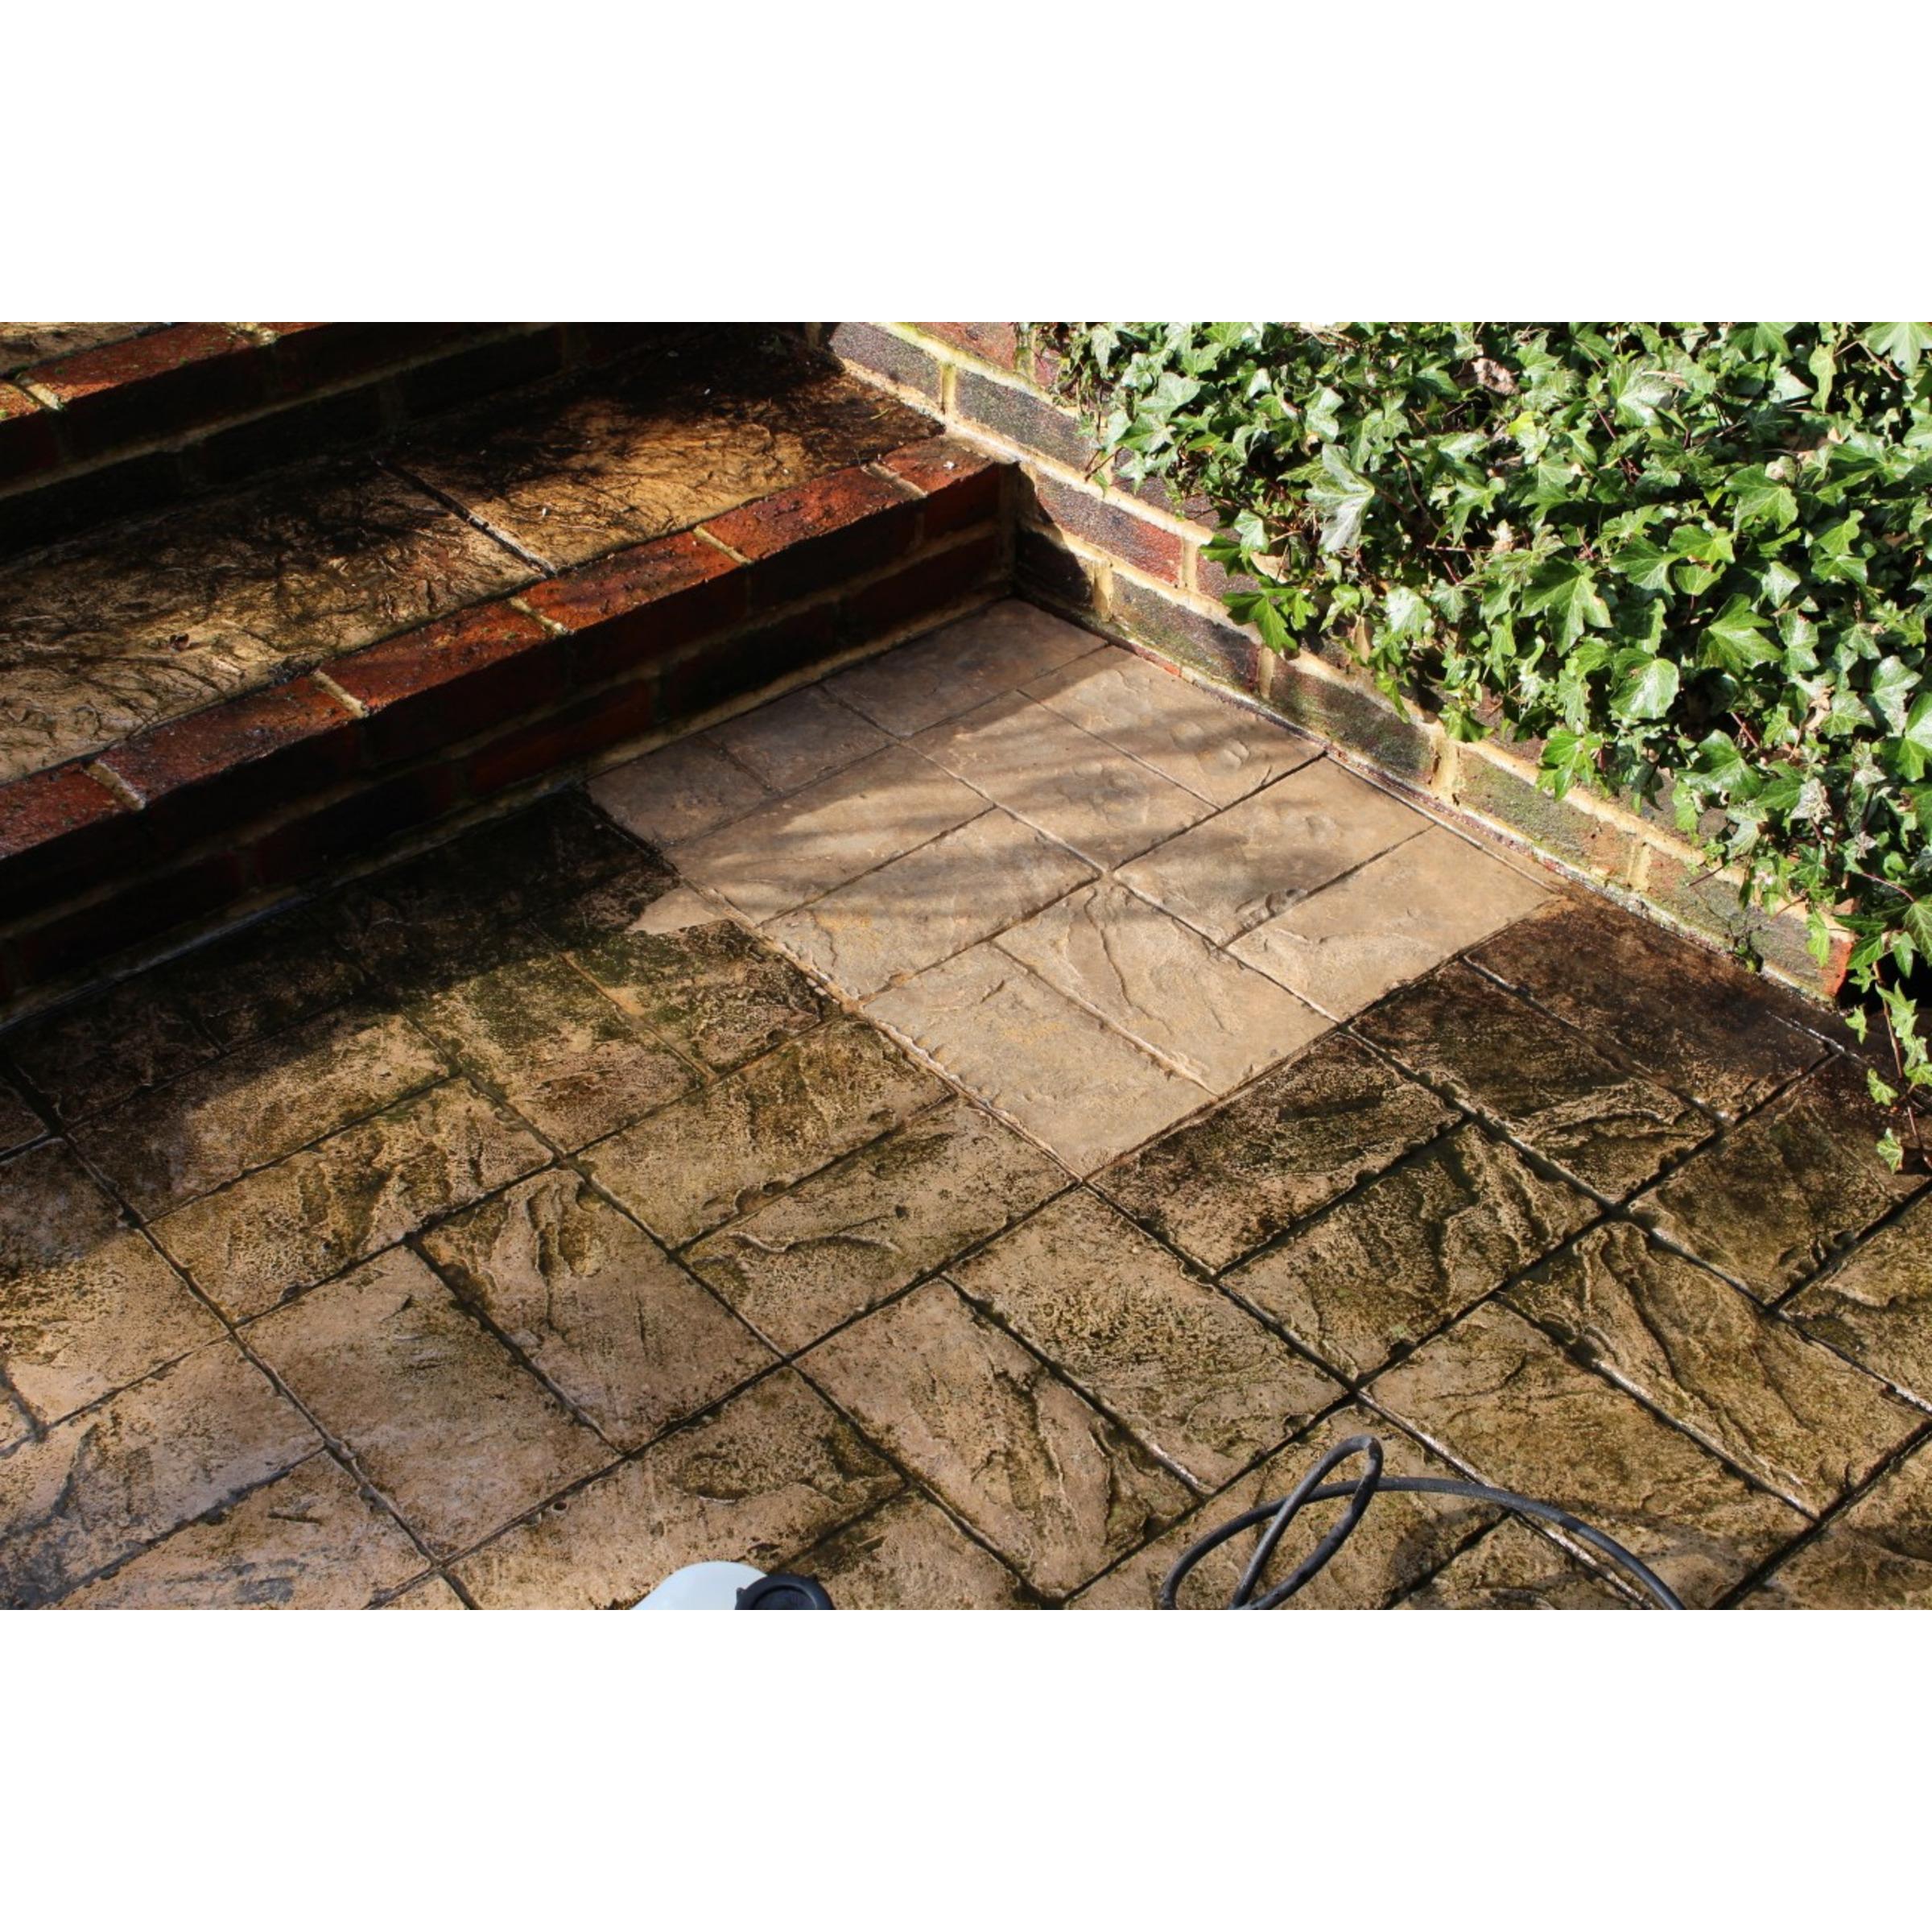 Sandstone Patio Cleaner | Concrete Patio Cleaner | Brick Patio ...